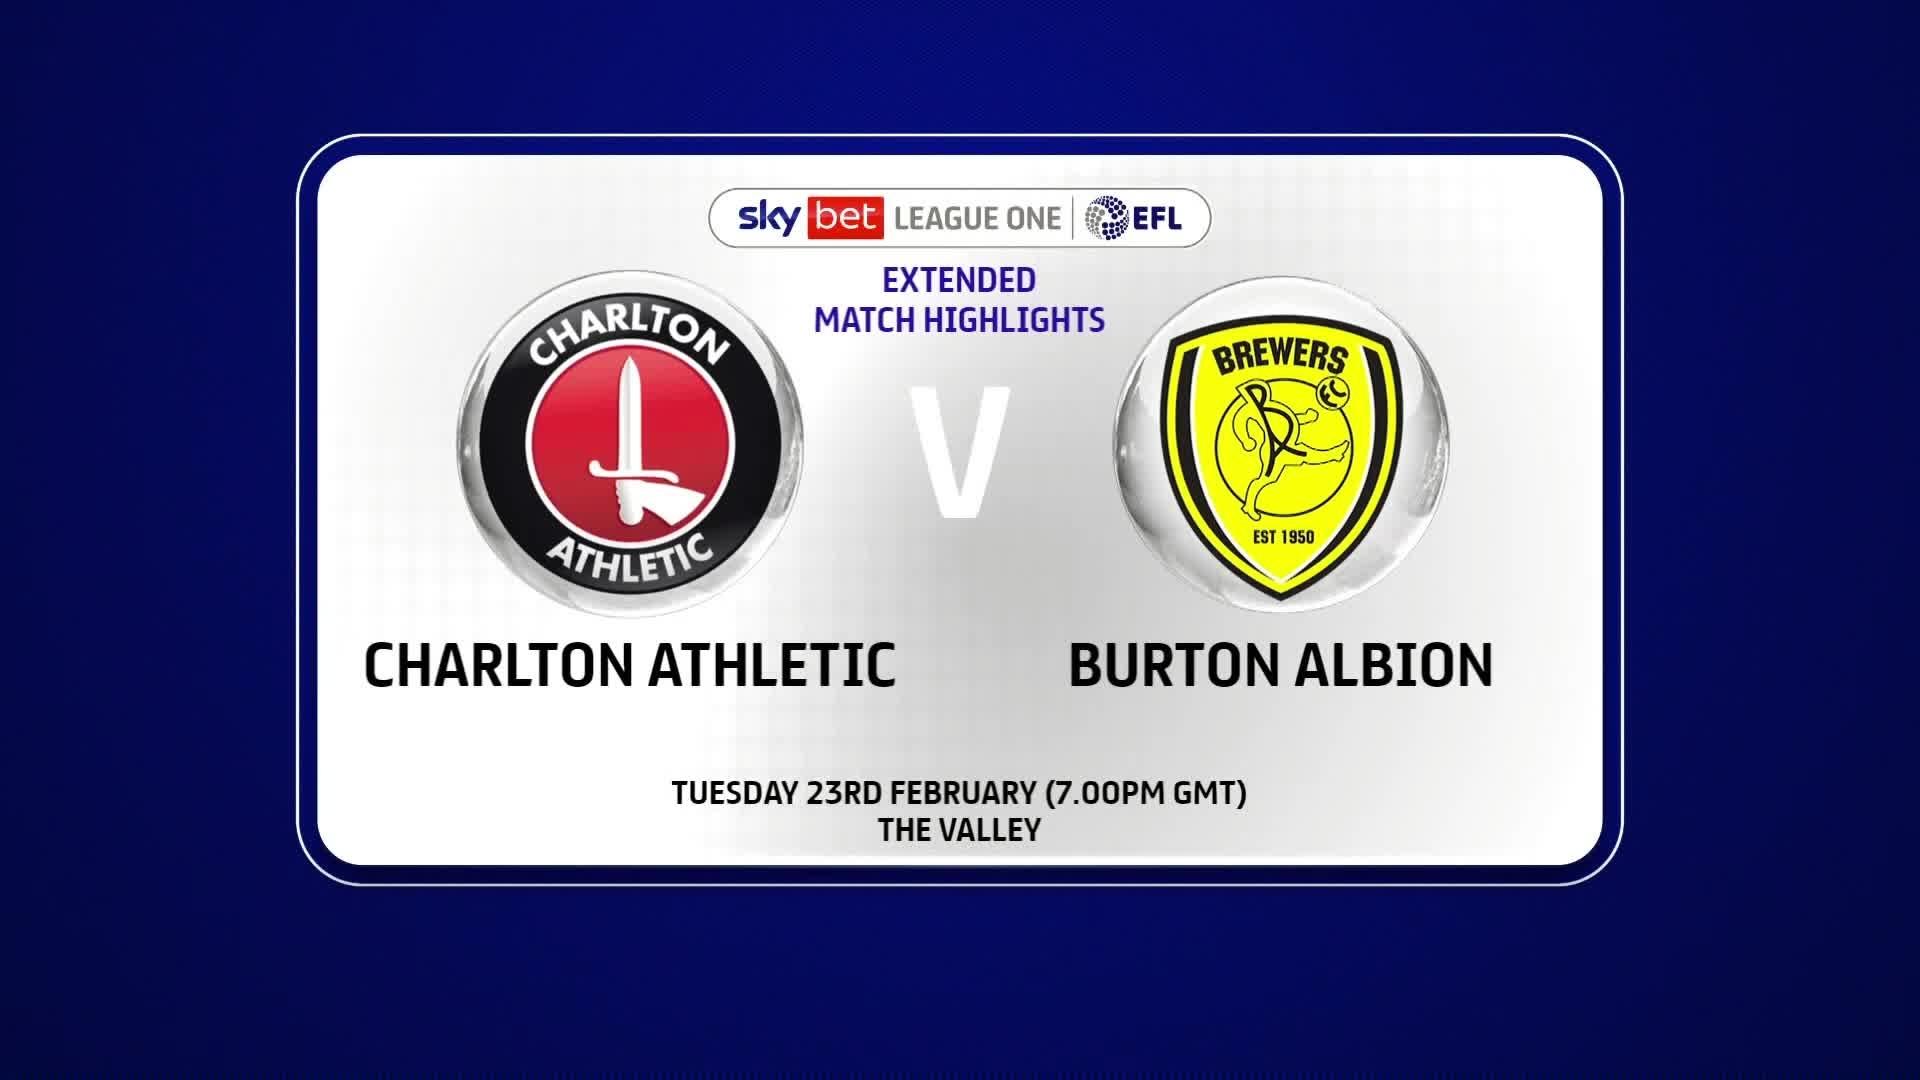 EXTENDED | Charlton 1 Burton Albion 2 (Feb 2021)